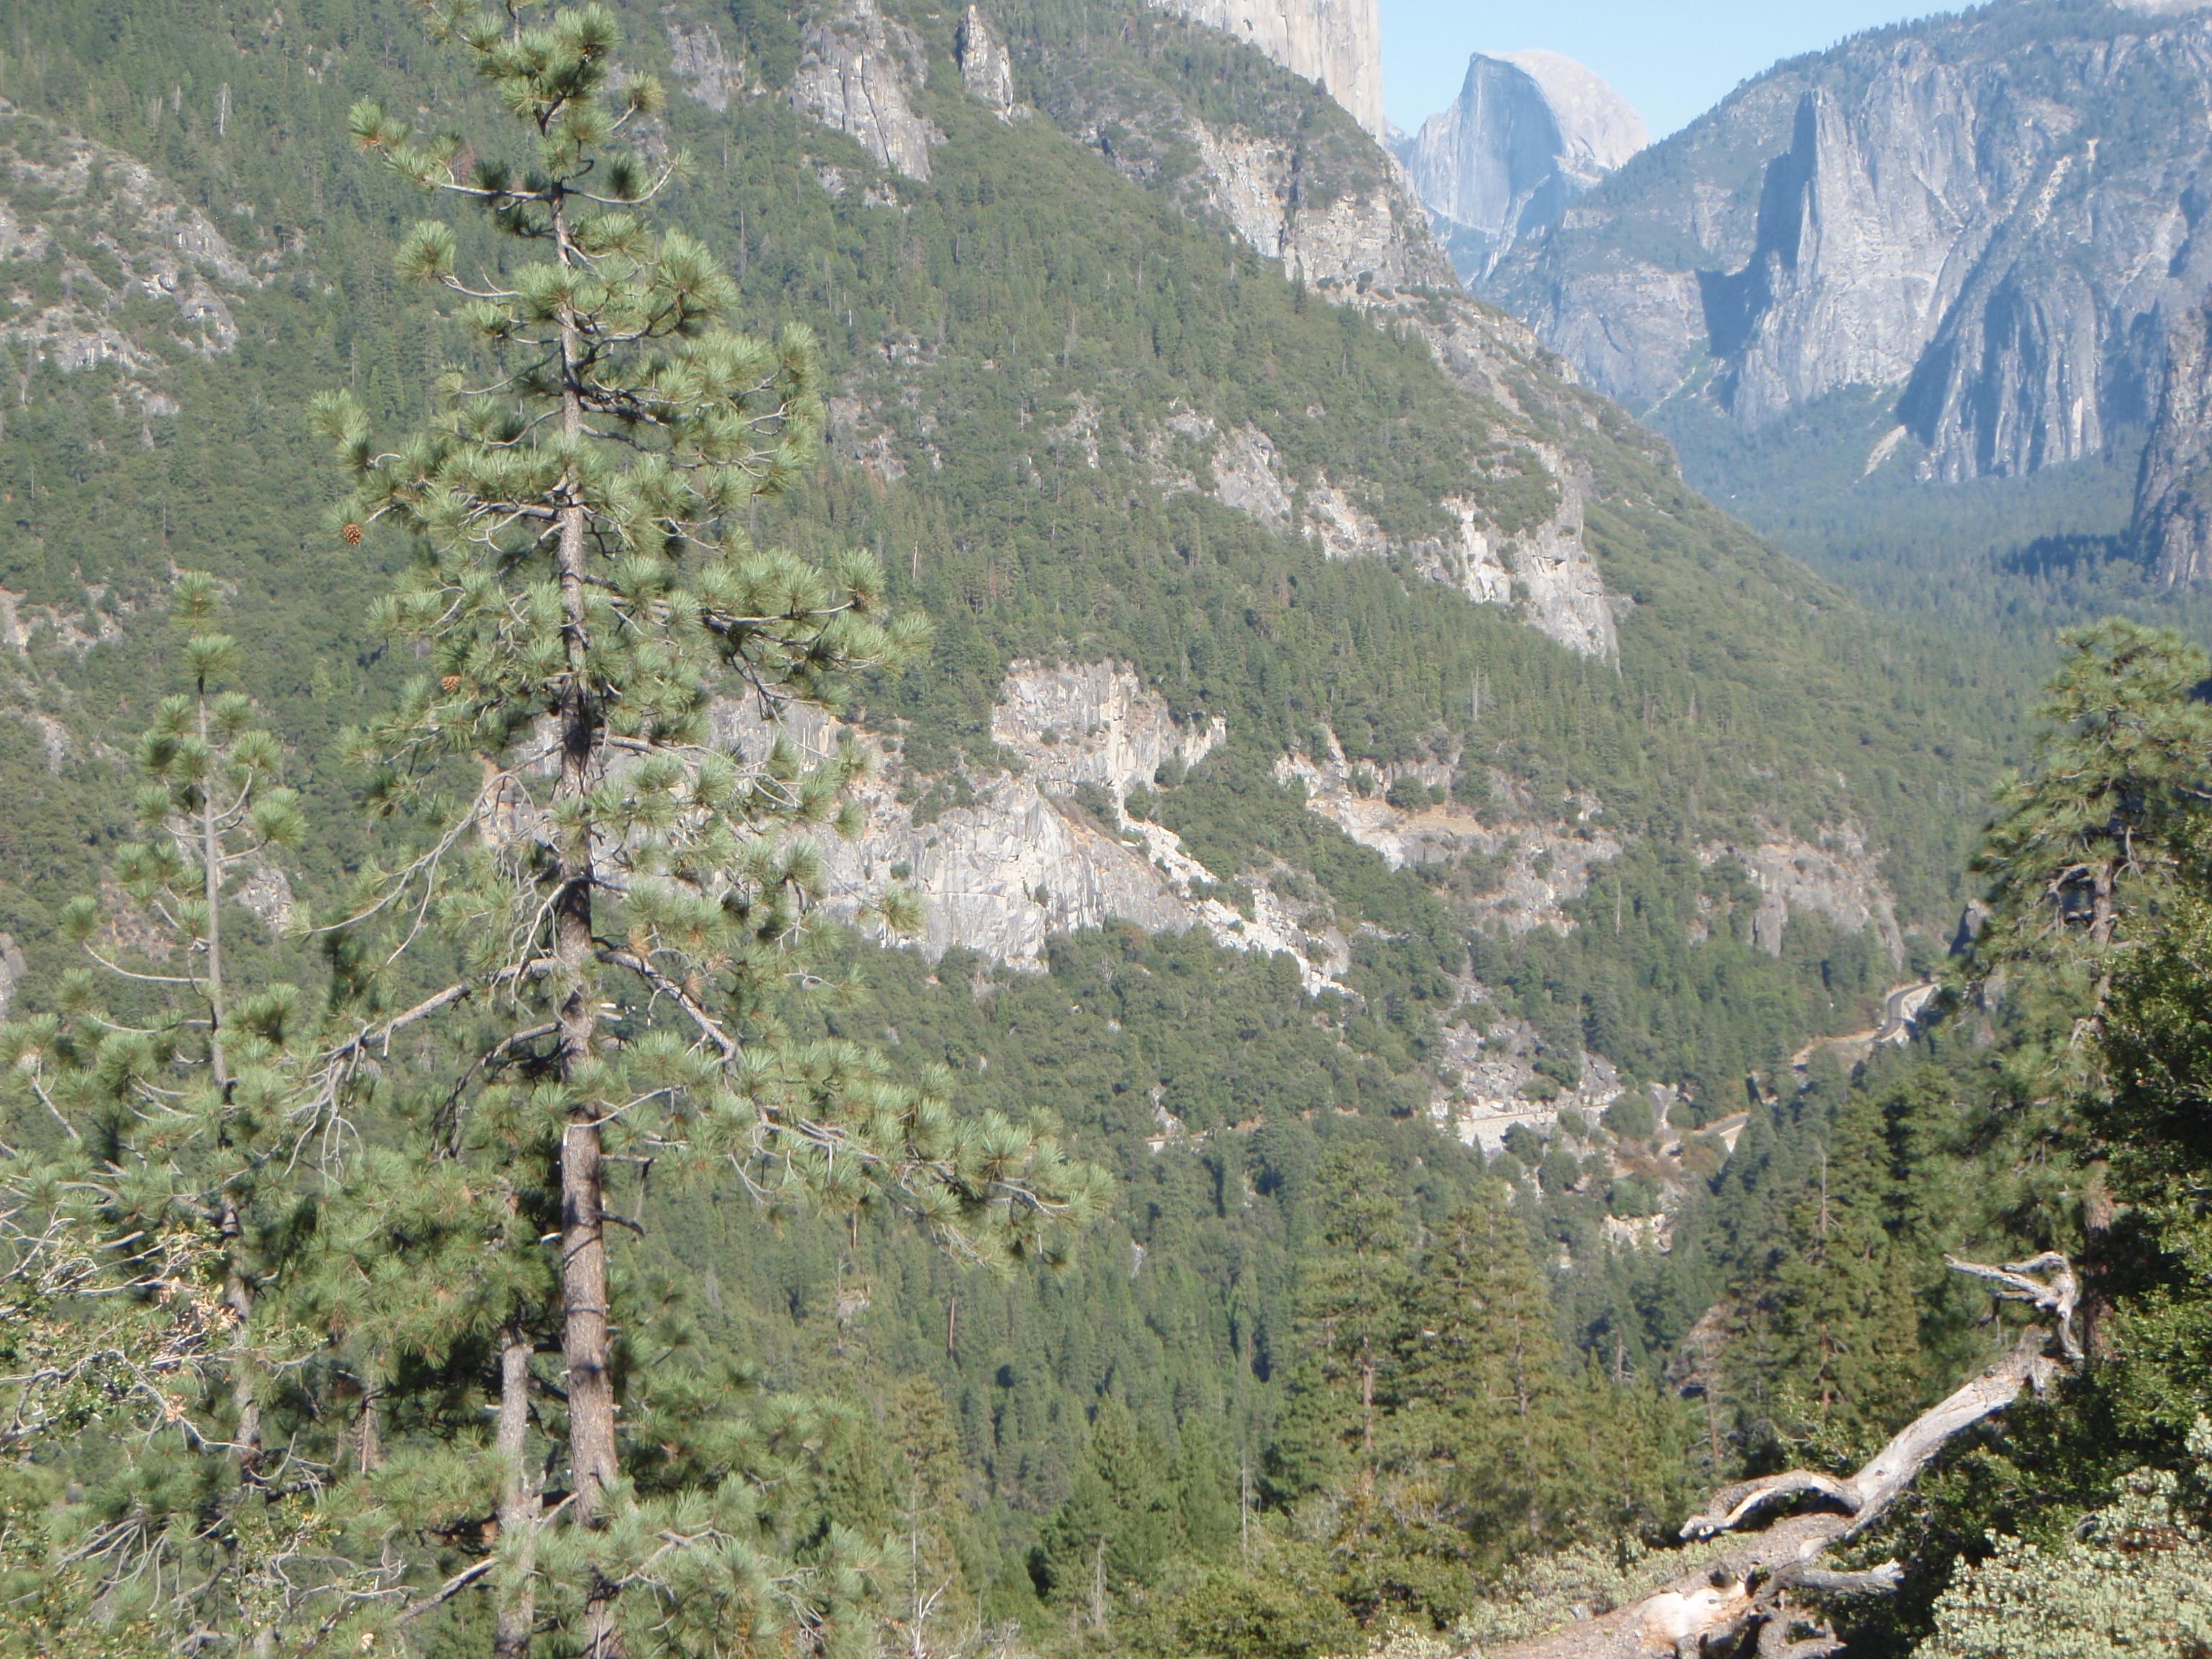 Yosemite national park photo